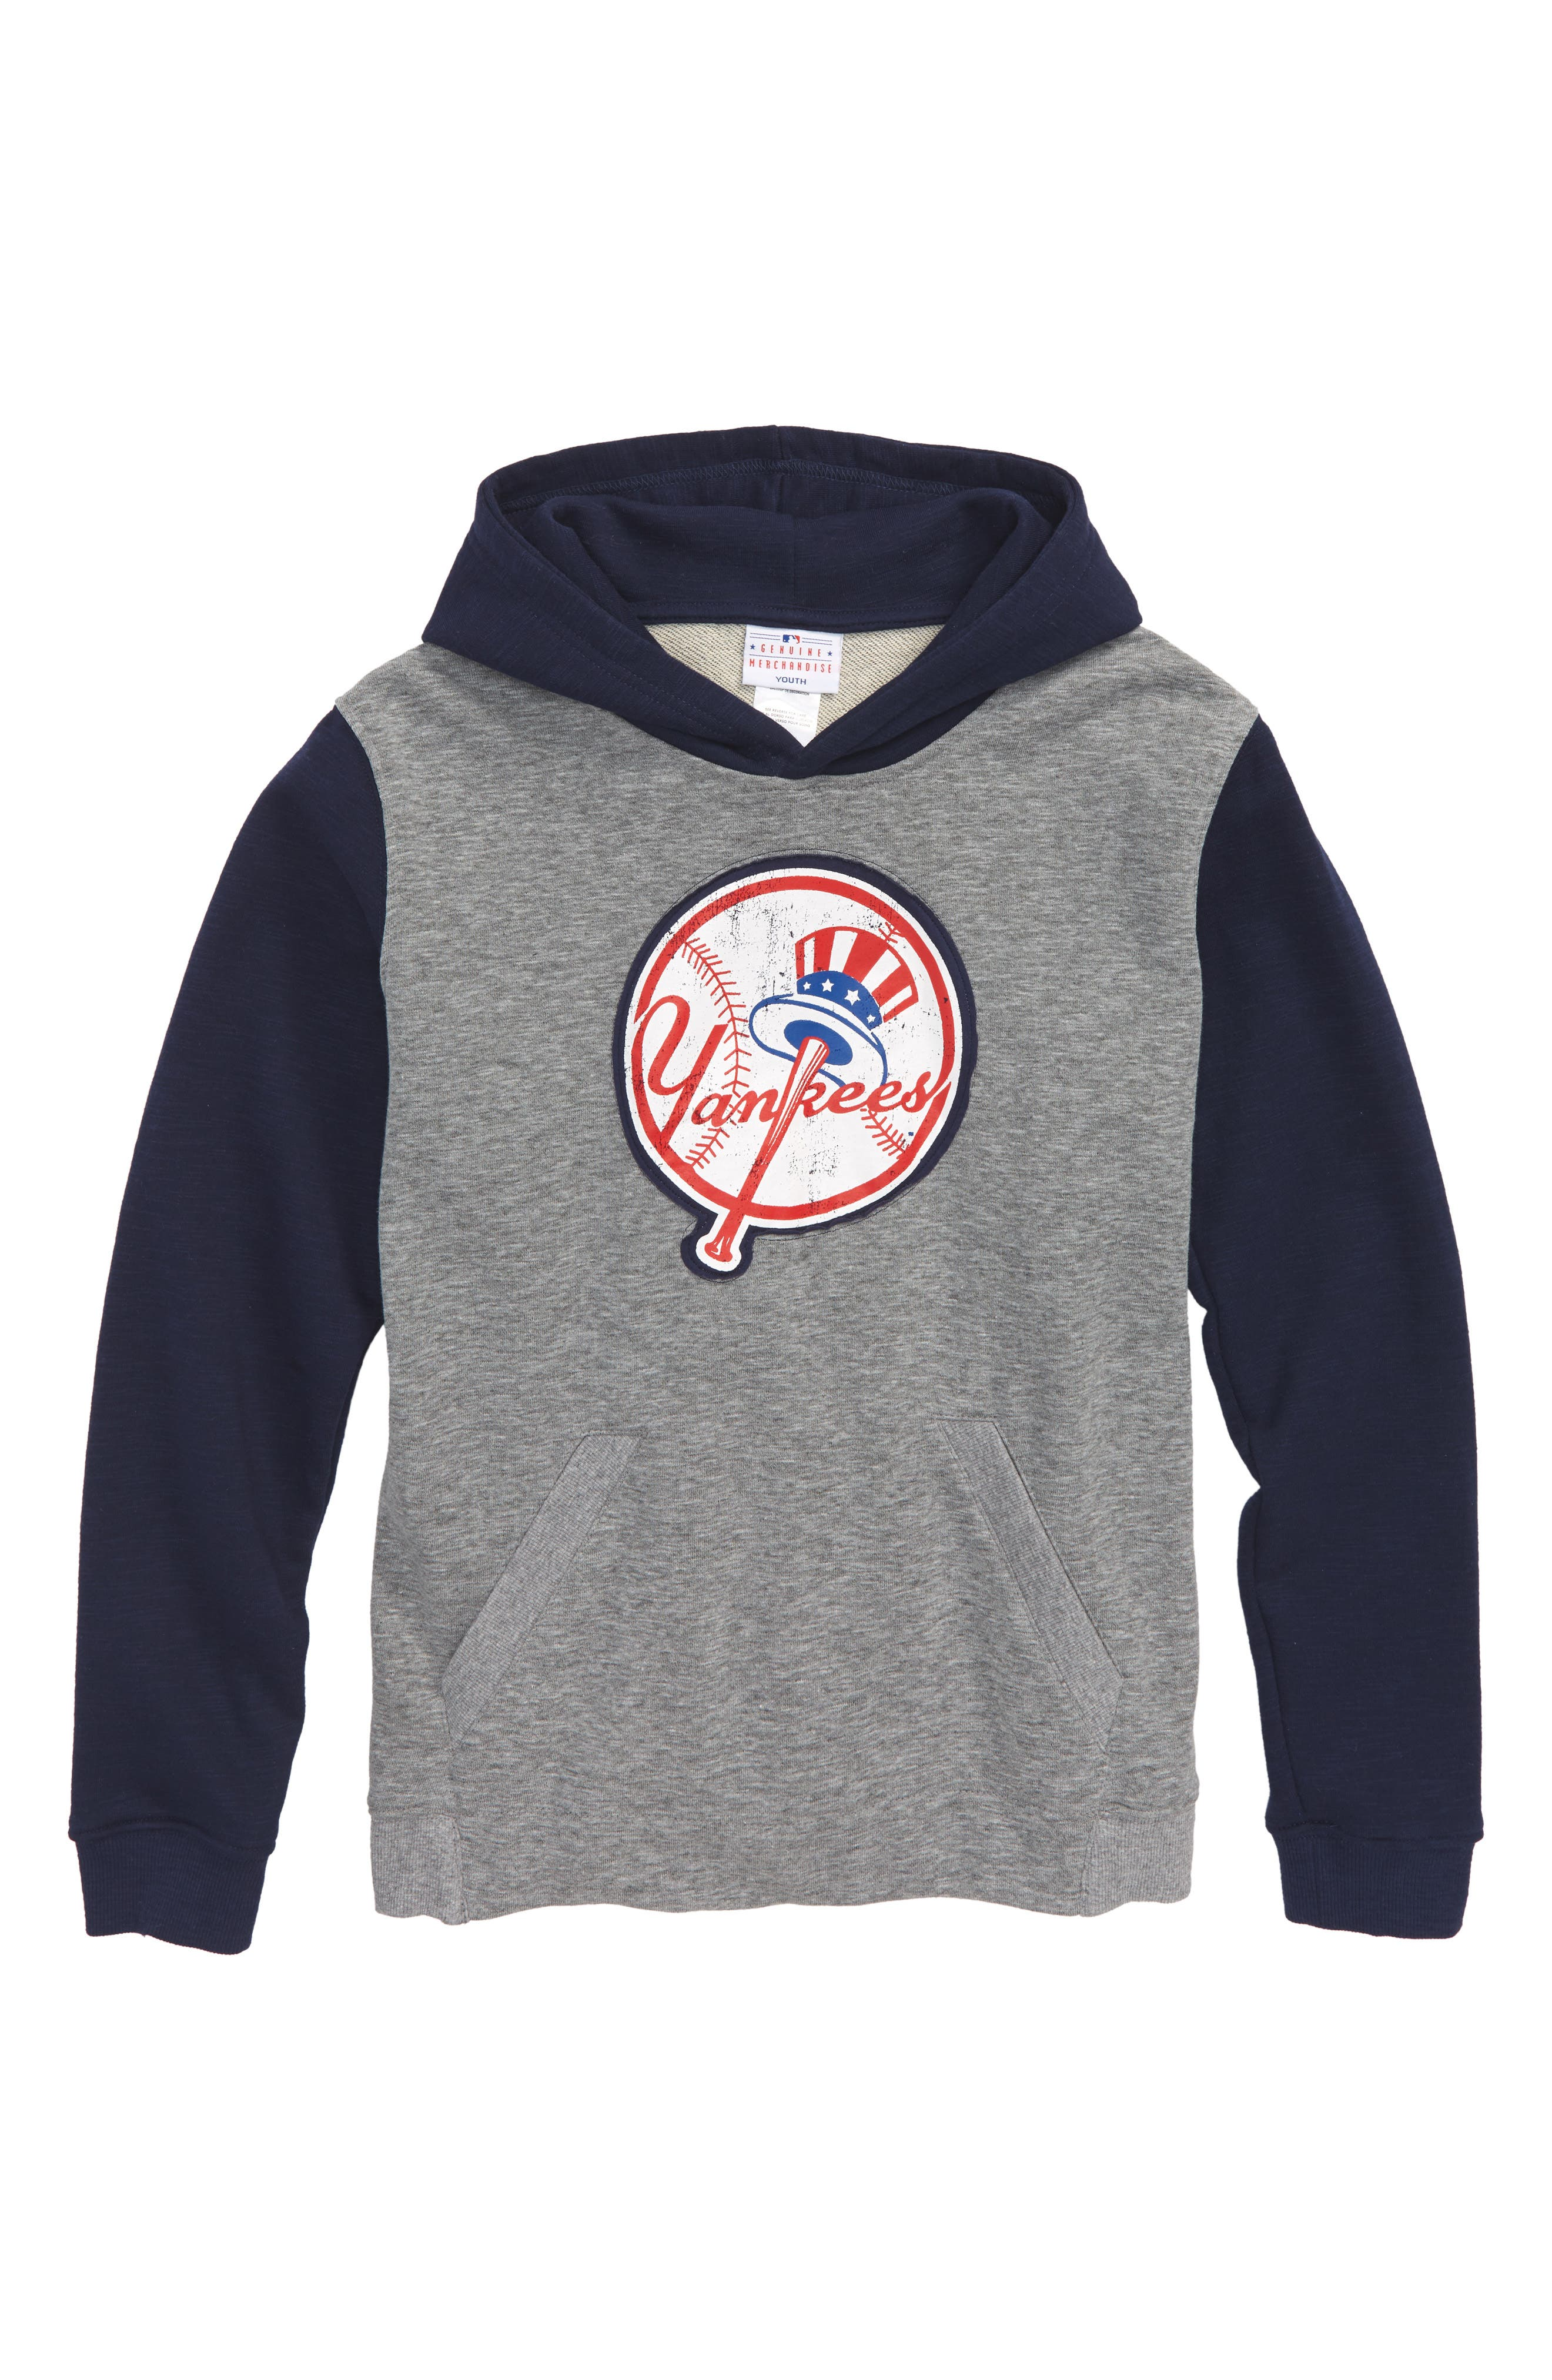 New Beginnings - New York Yankees Pullover Hoodie,                             Main thumbnail 1, color,                             020